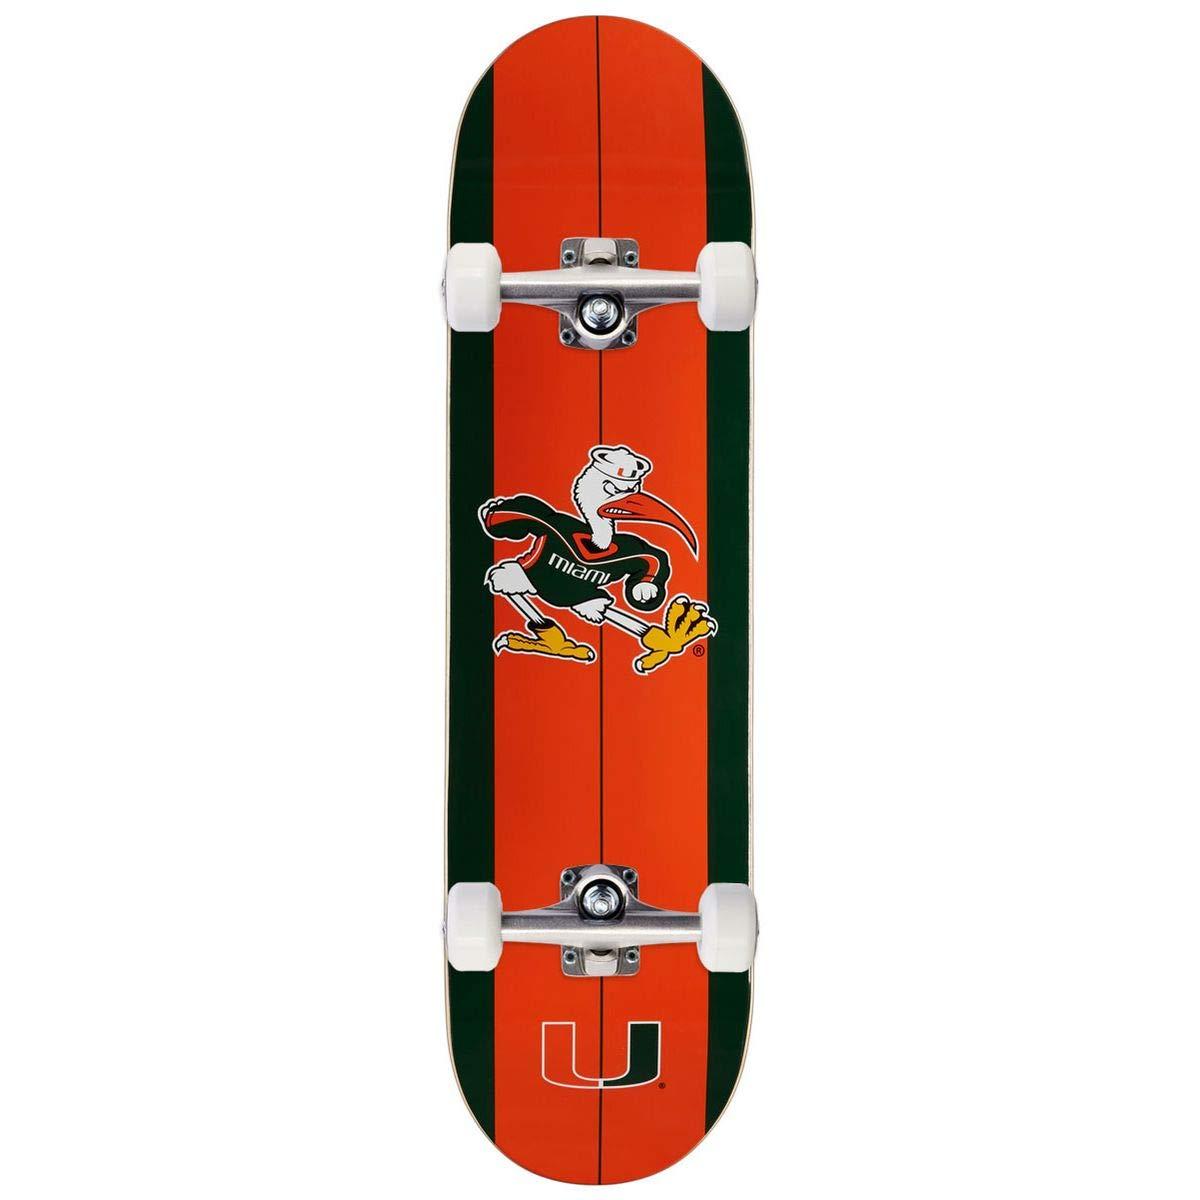 7.75 Rout Supply Co University of Miami Sebastian Skateboard Complete